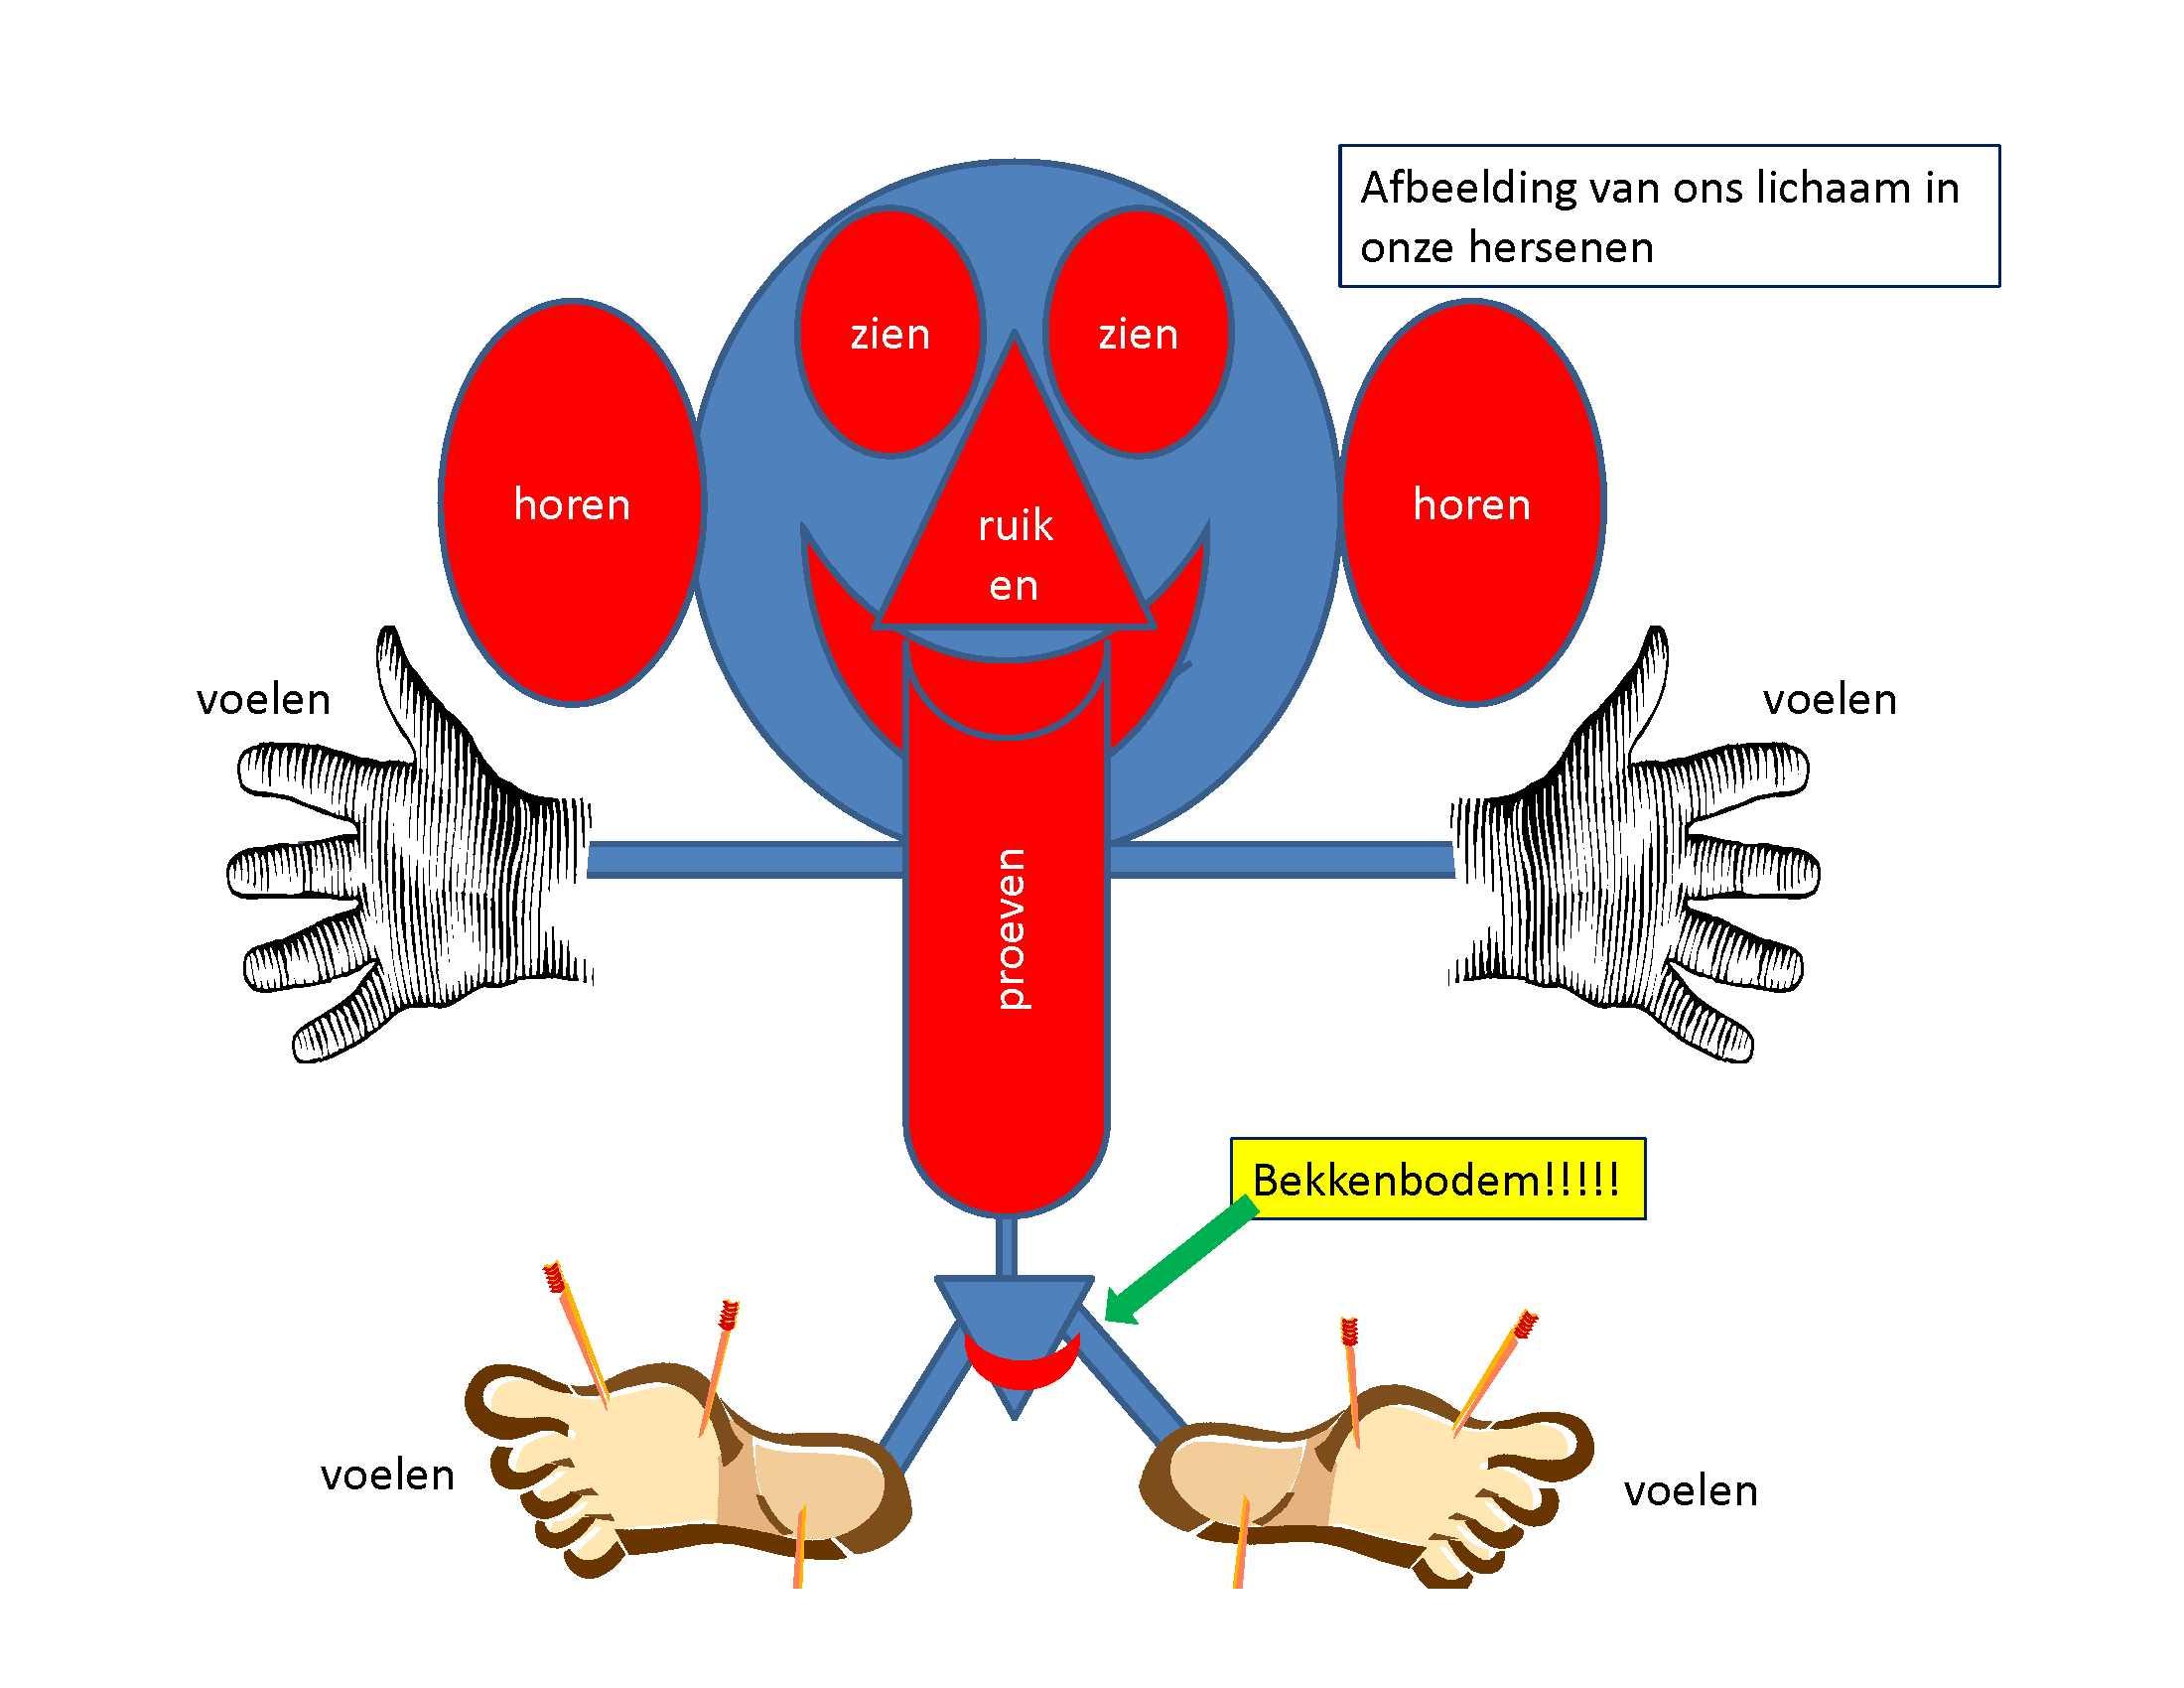 ontspannings-oefeningen voor de bekkenbodem - bekkenbodem online